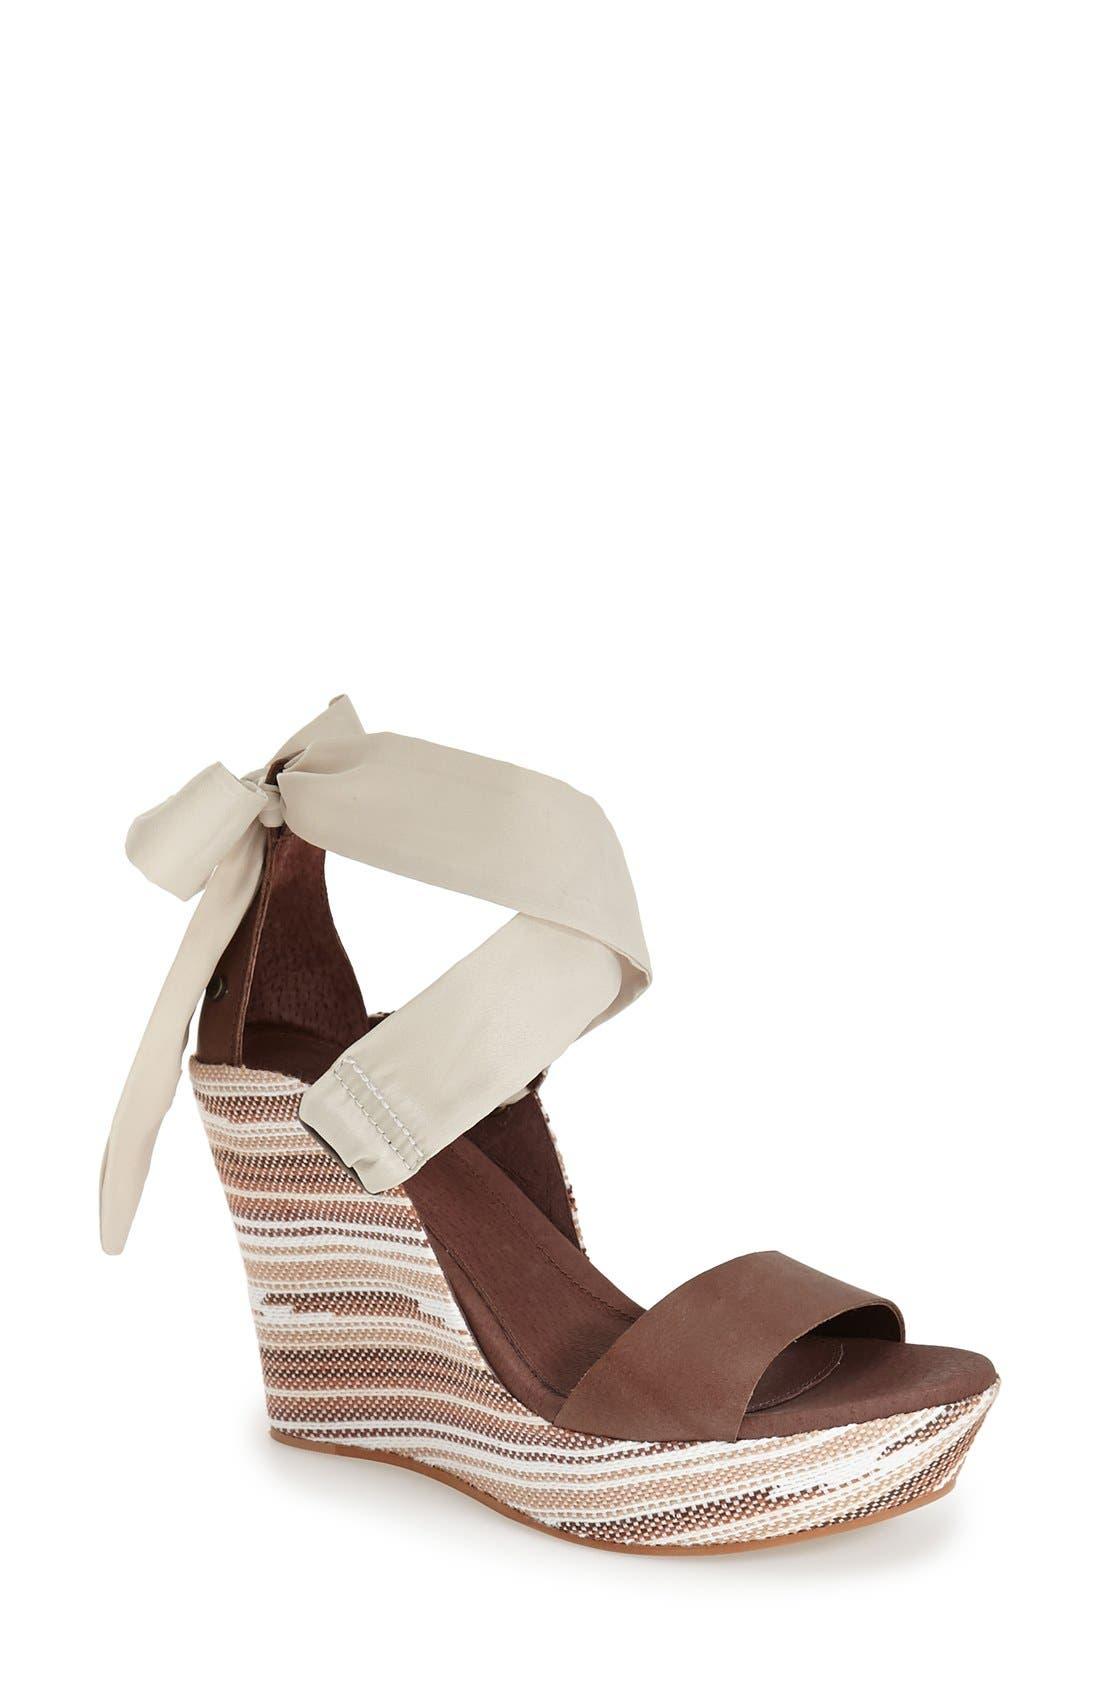 UGG<SUP>®</SUP> 'Jules Serape' Platform Wedge Sandal, Main, color, 201